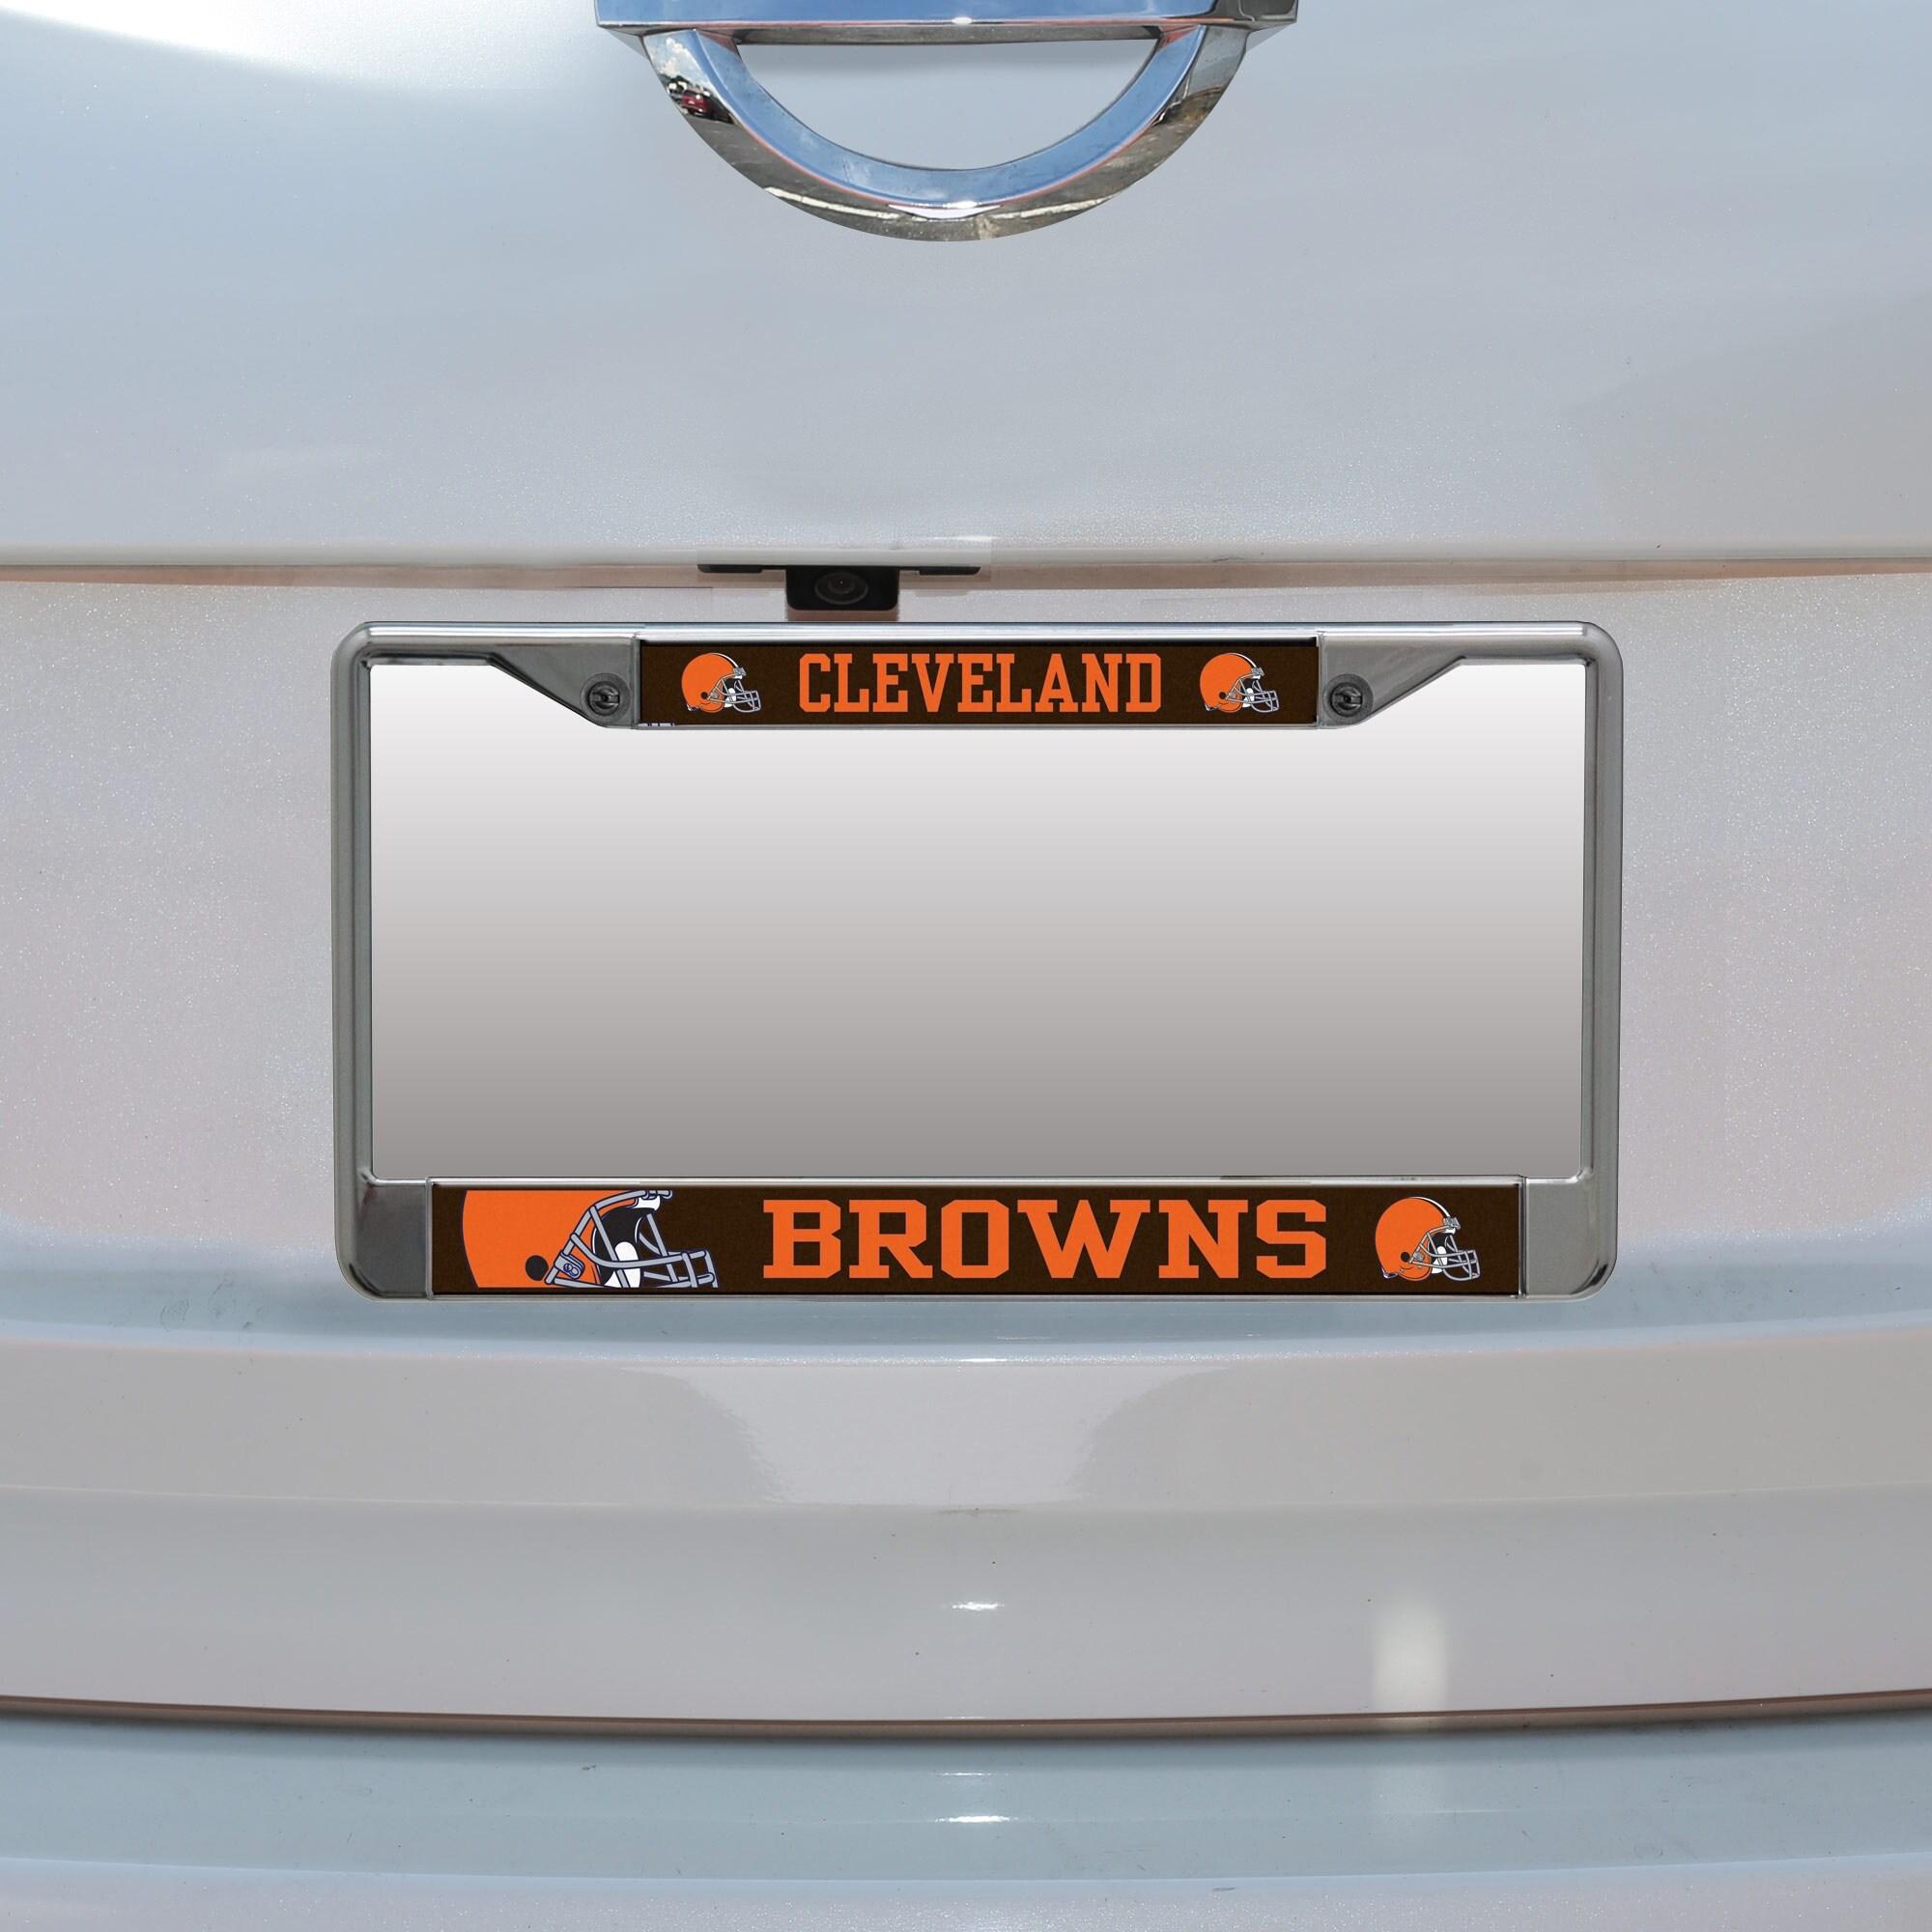 Cleveland Browns Small Over Large Mega License Plate Frame